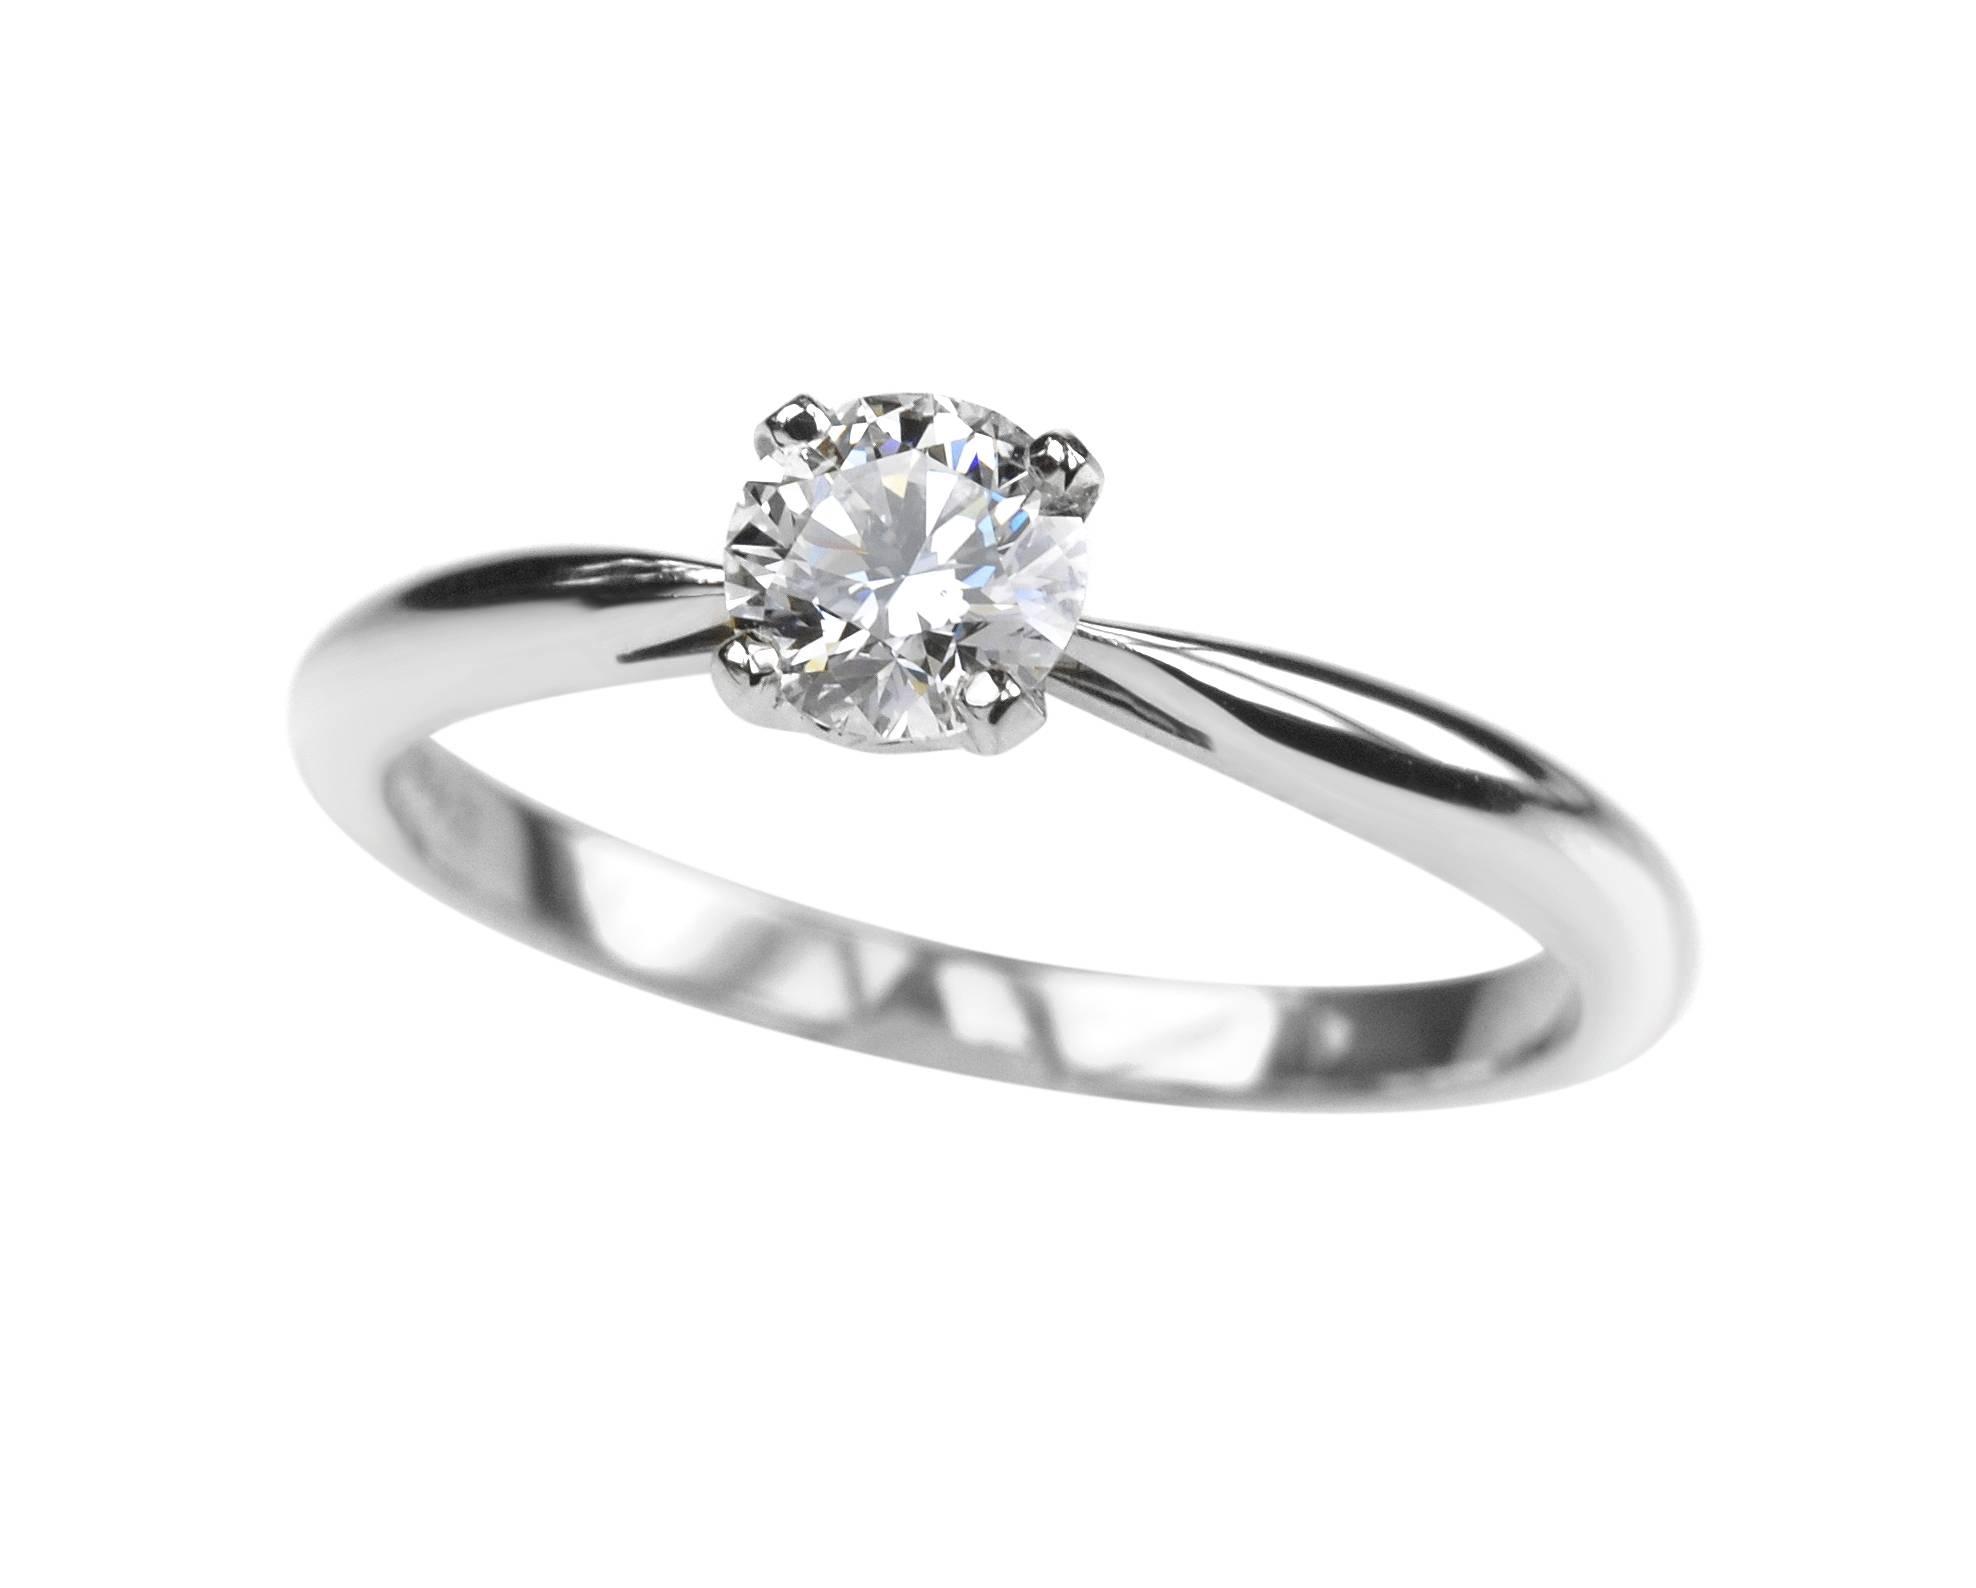 Diamond Engagement Rings London, Platinum Engagement Rings Throughout Diamond Wedding Rings (View 10 of 15)